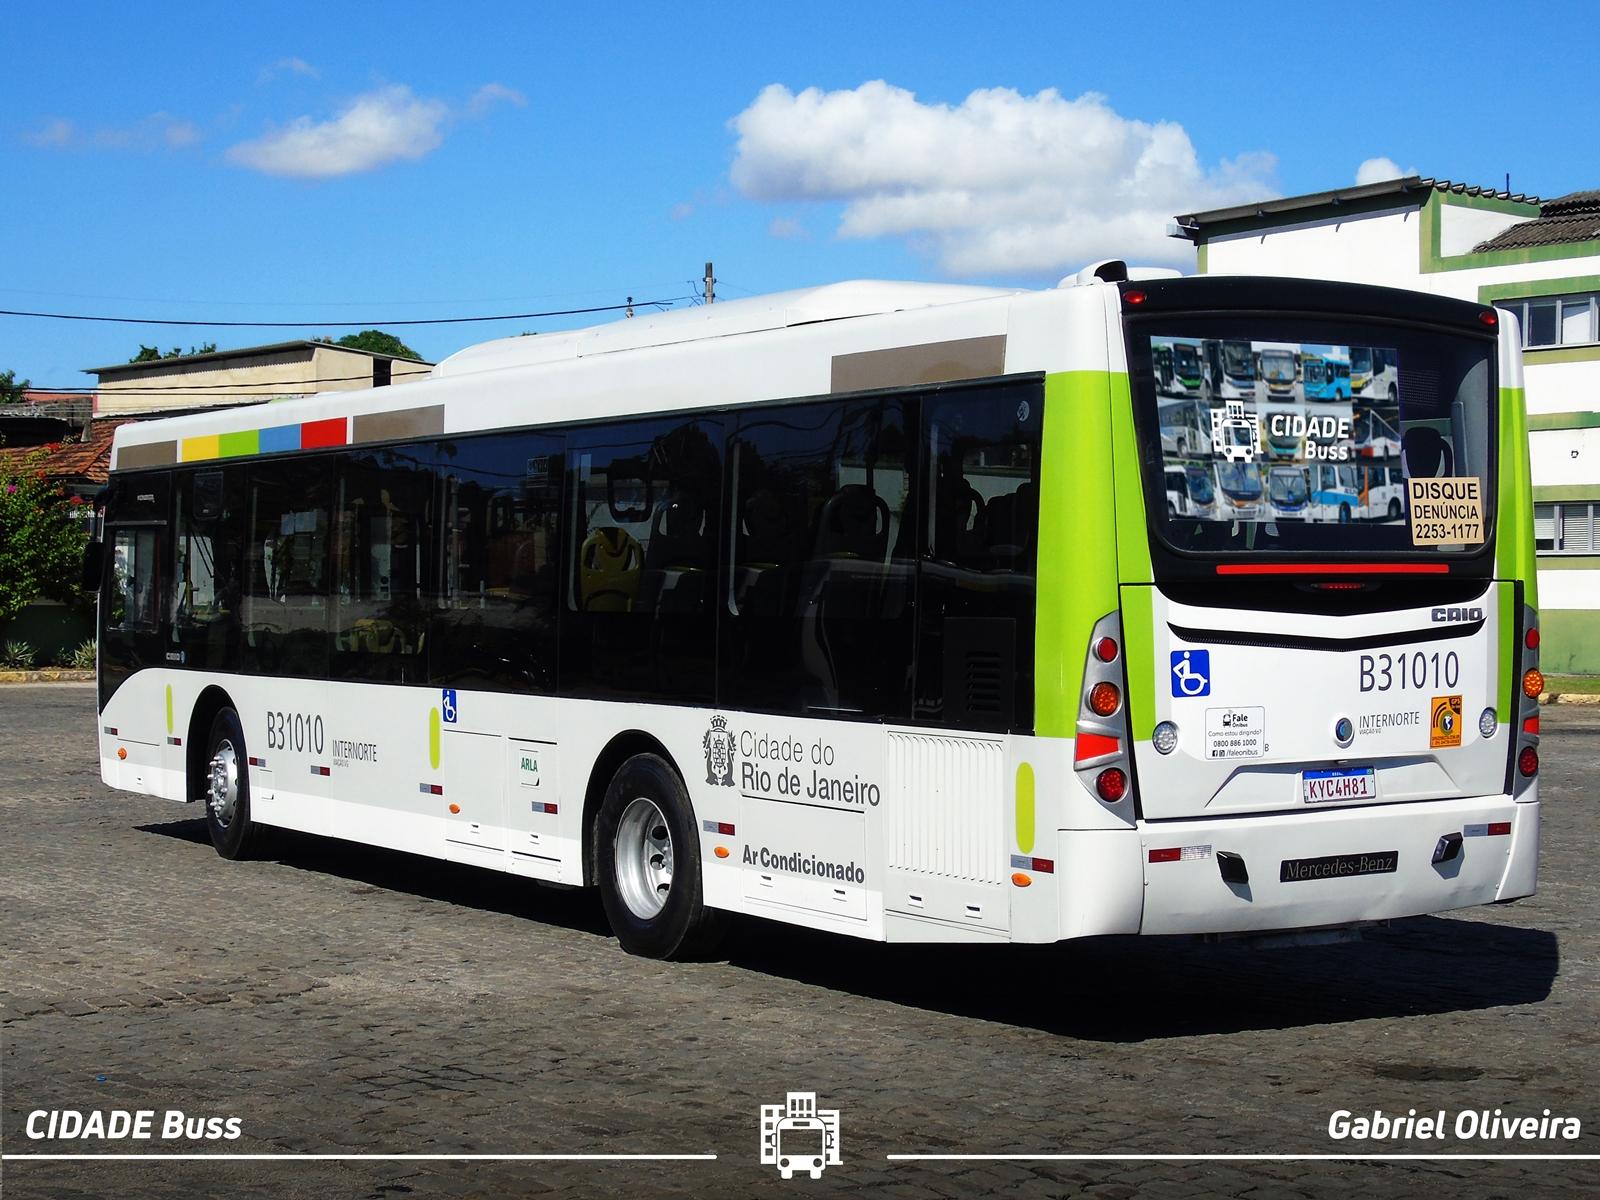 Rio de Janeiro Bus